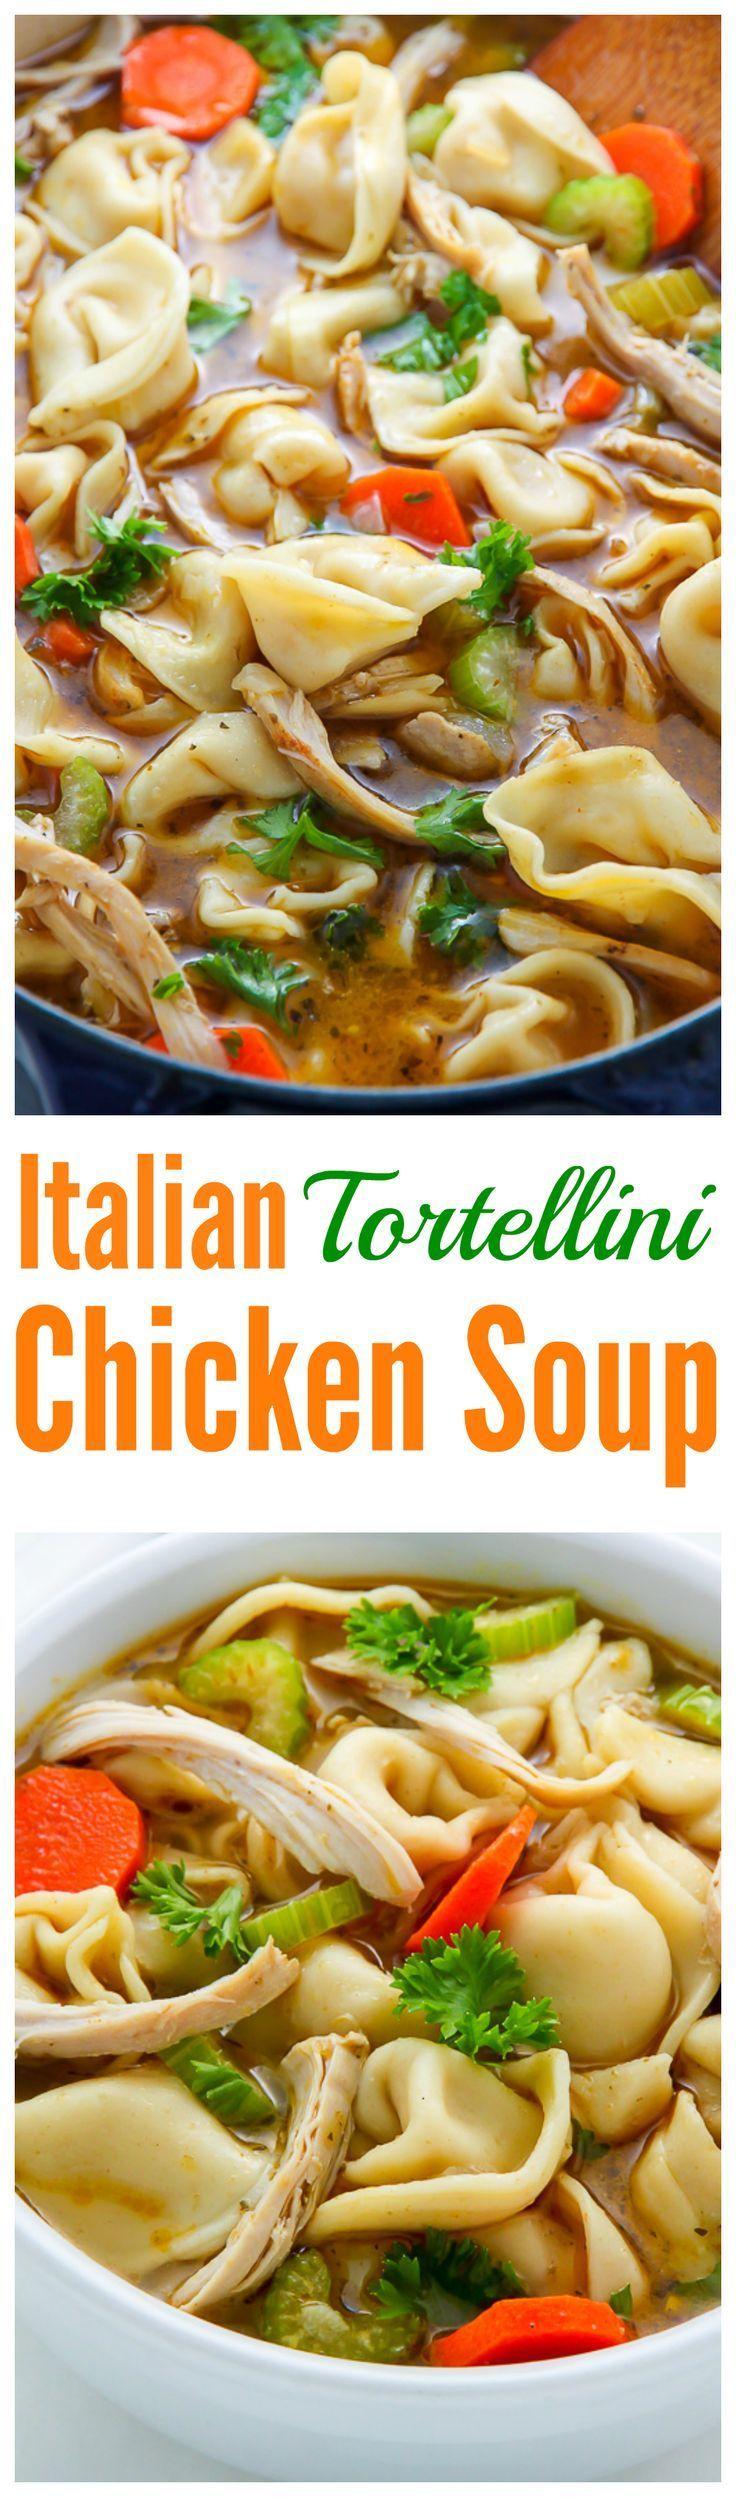 Italian Chicken Tortellini Soup | Recipe | The o'jays ...